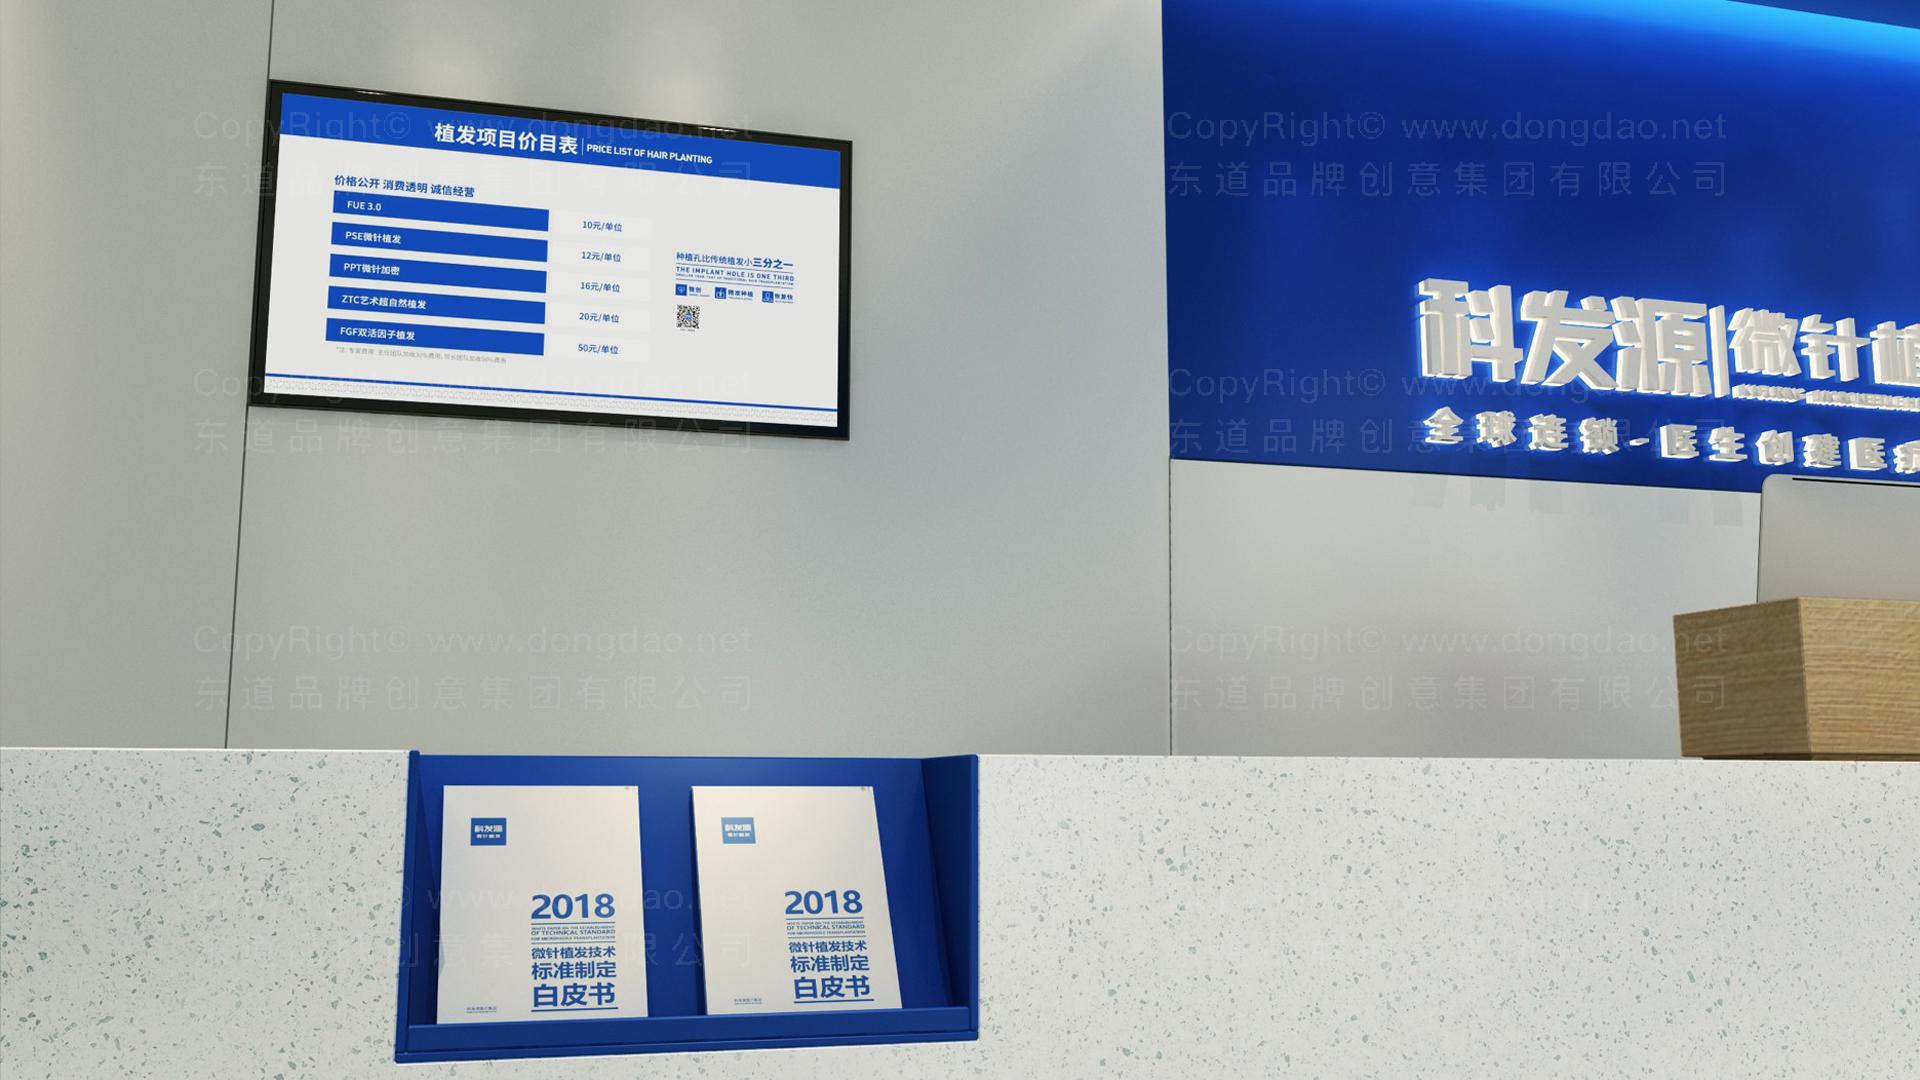 Si設計服務助力科發源品牌升級